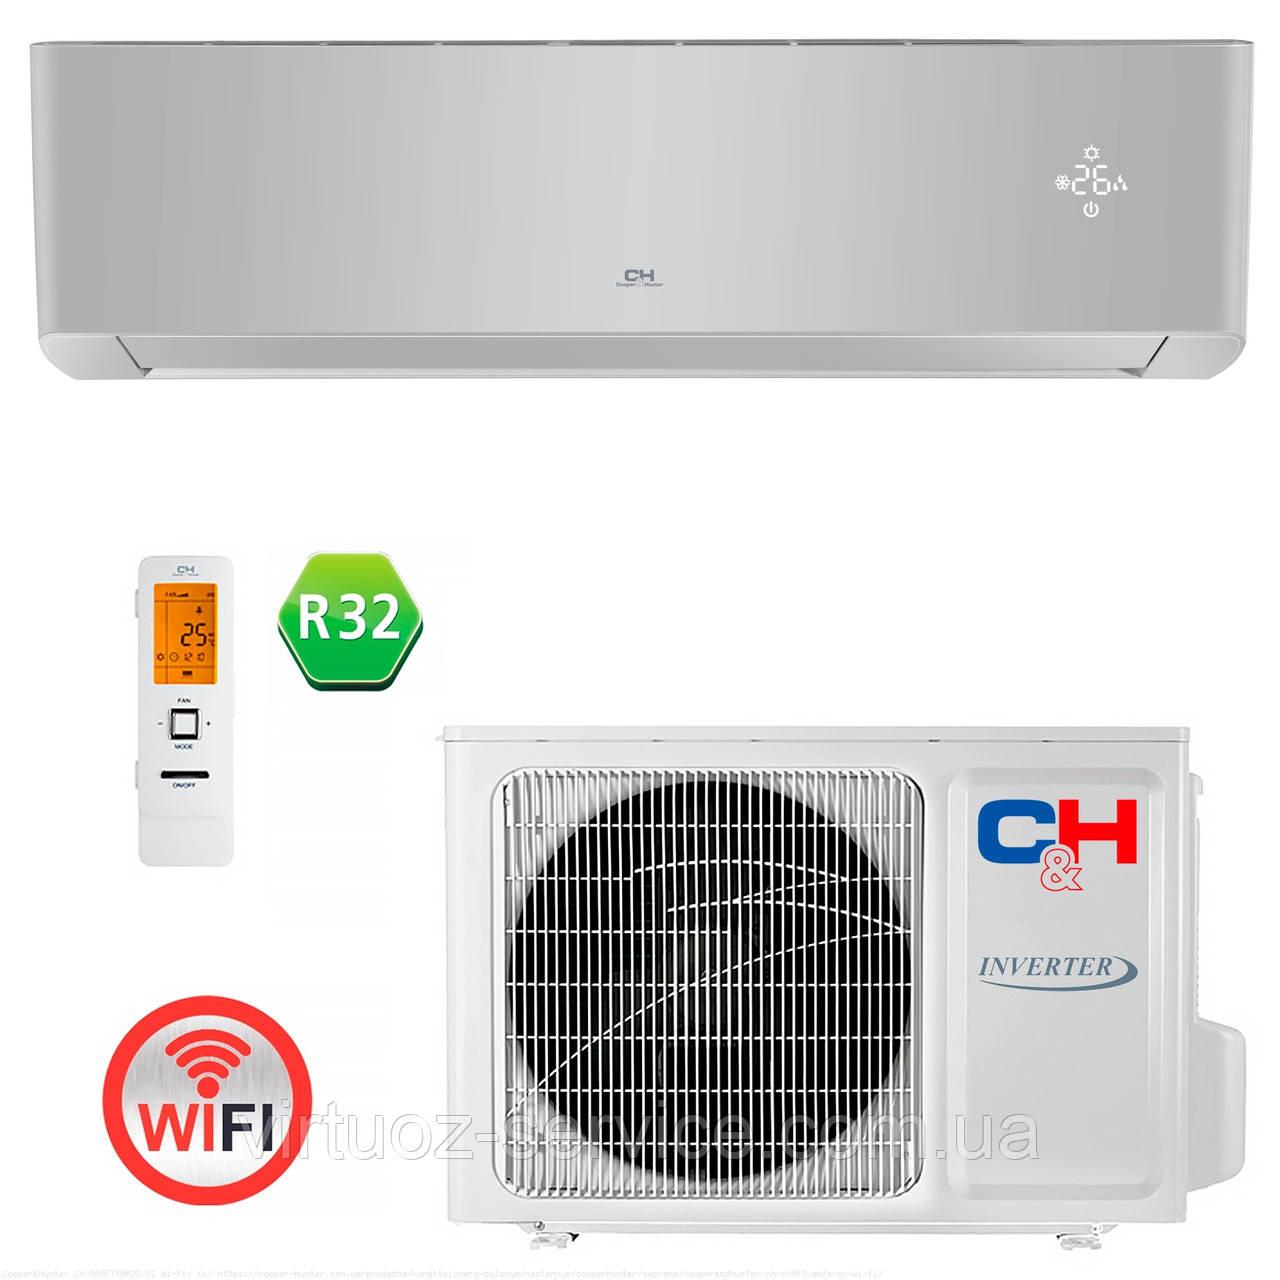 Инверторный кондиционер Cooper&Hunter CH-S09FTXAM2S-WP Wi-Fi